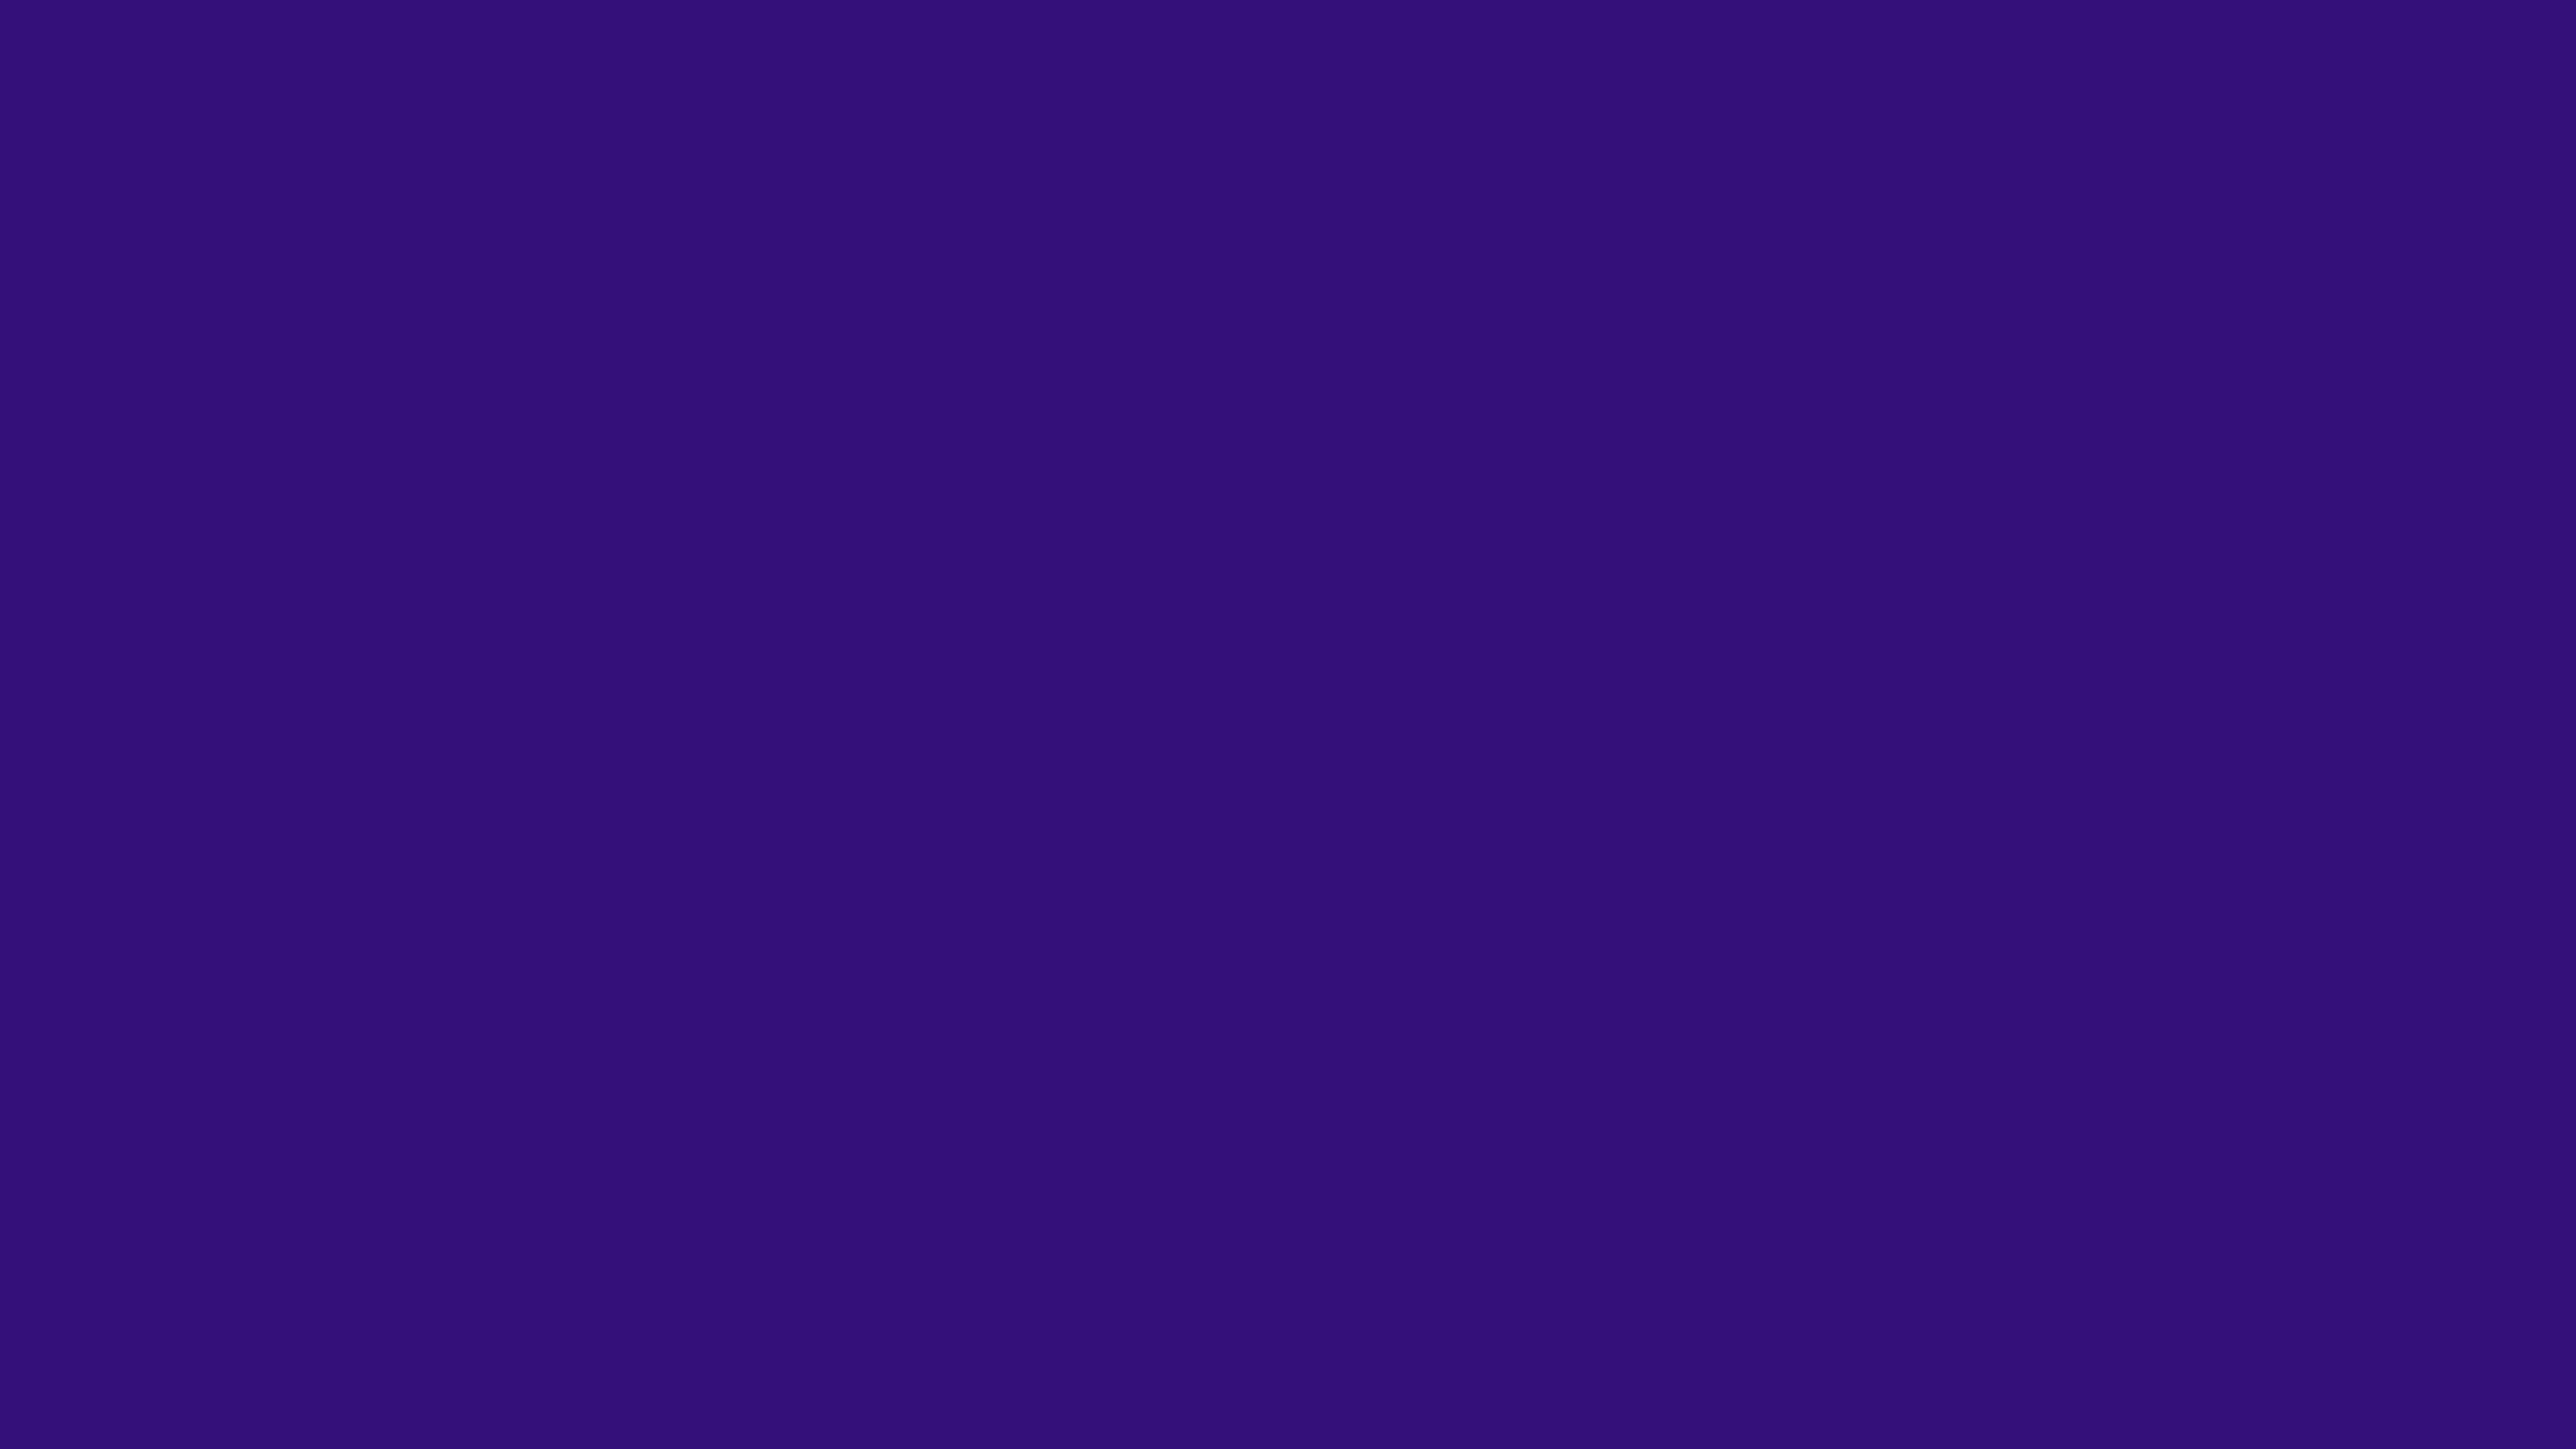 4096x2304 Persian Indigo Solid Color Background